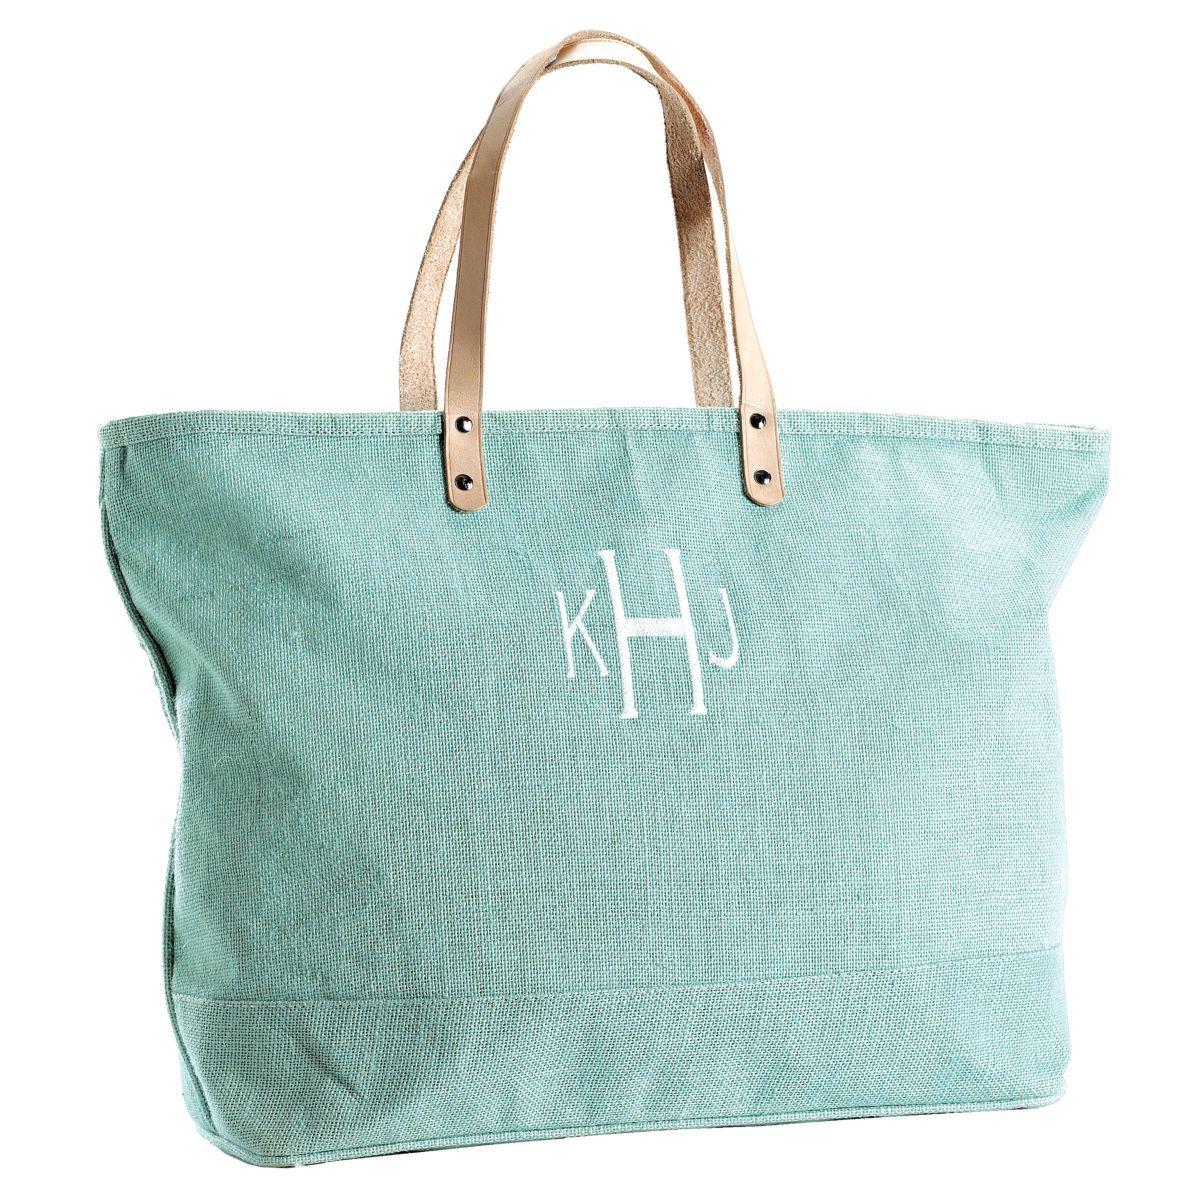 ballard tote bags -large beach bag | dressed to the nines